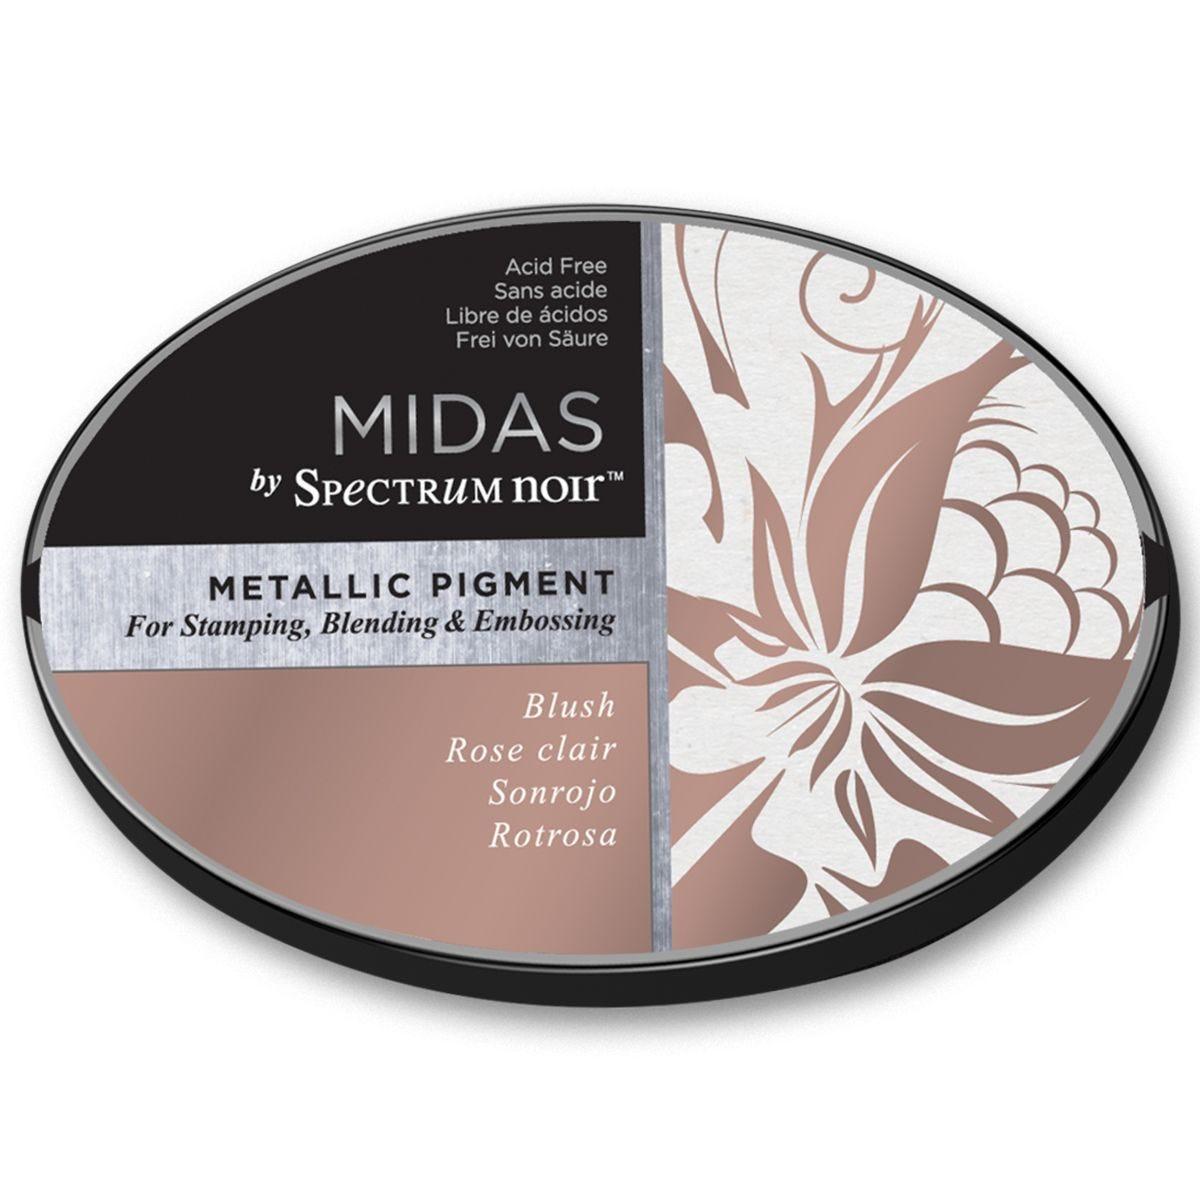 Midas by Spectrum Noir Metallic Pigment Inkpad - Blush